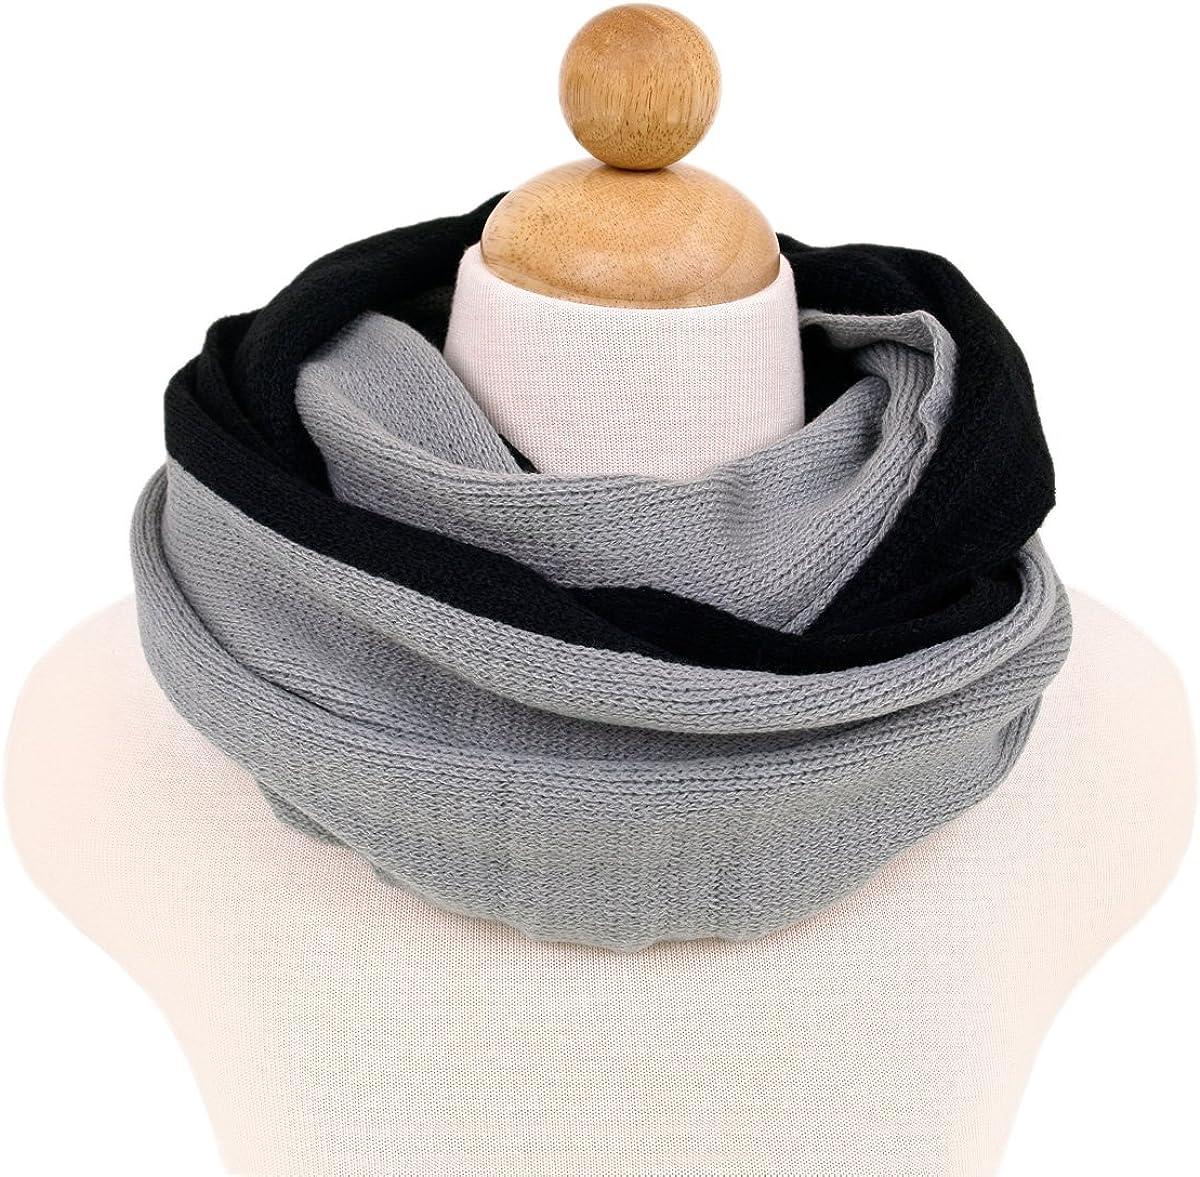 Two-Tone Winter Knit Warm...